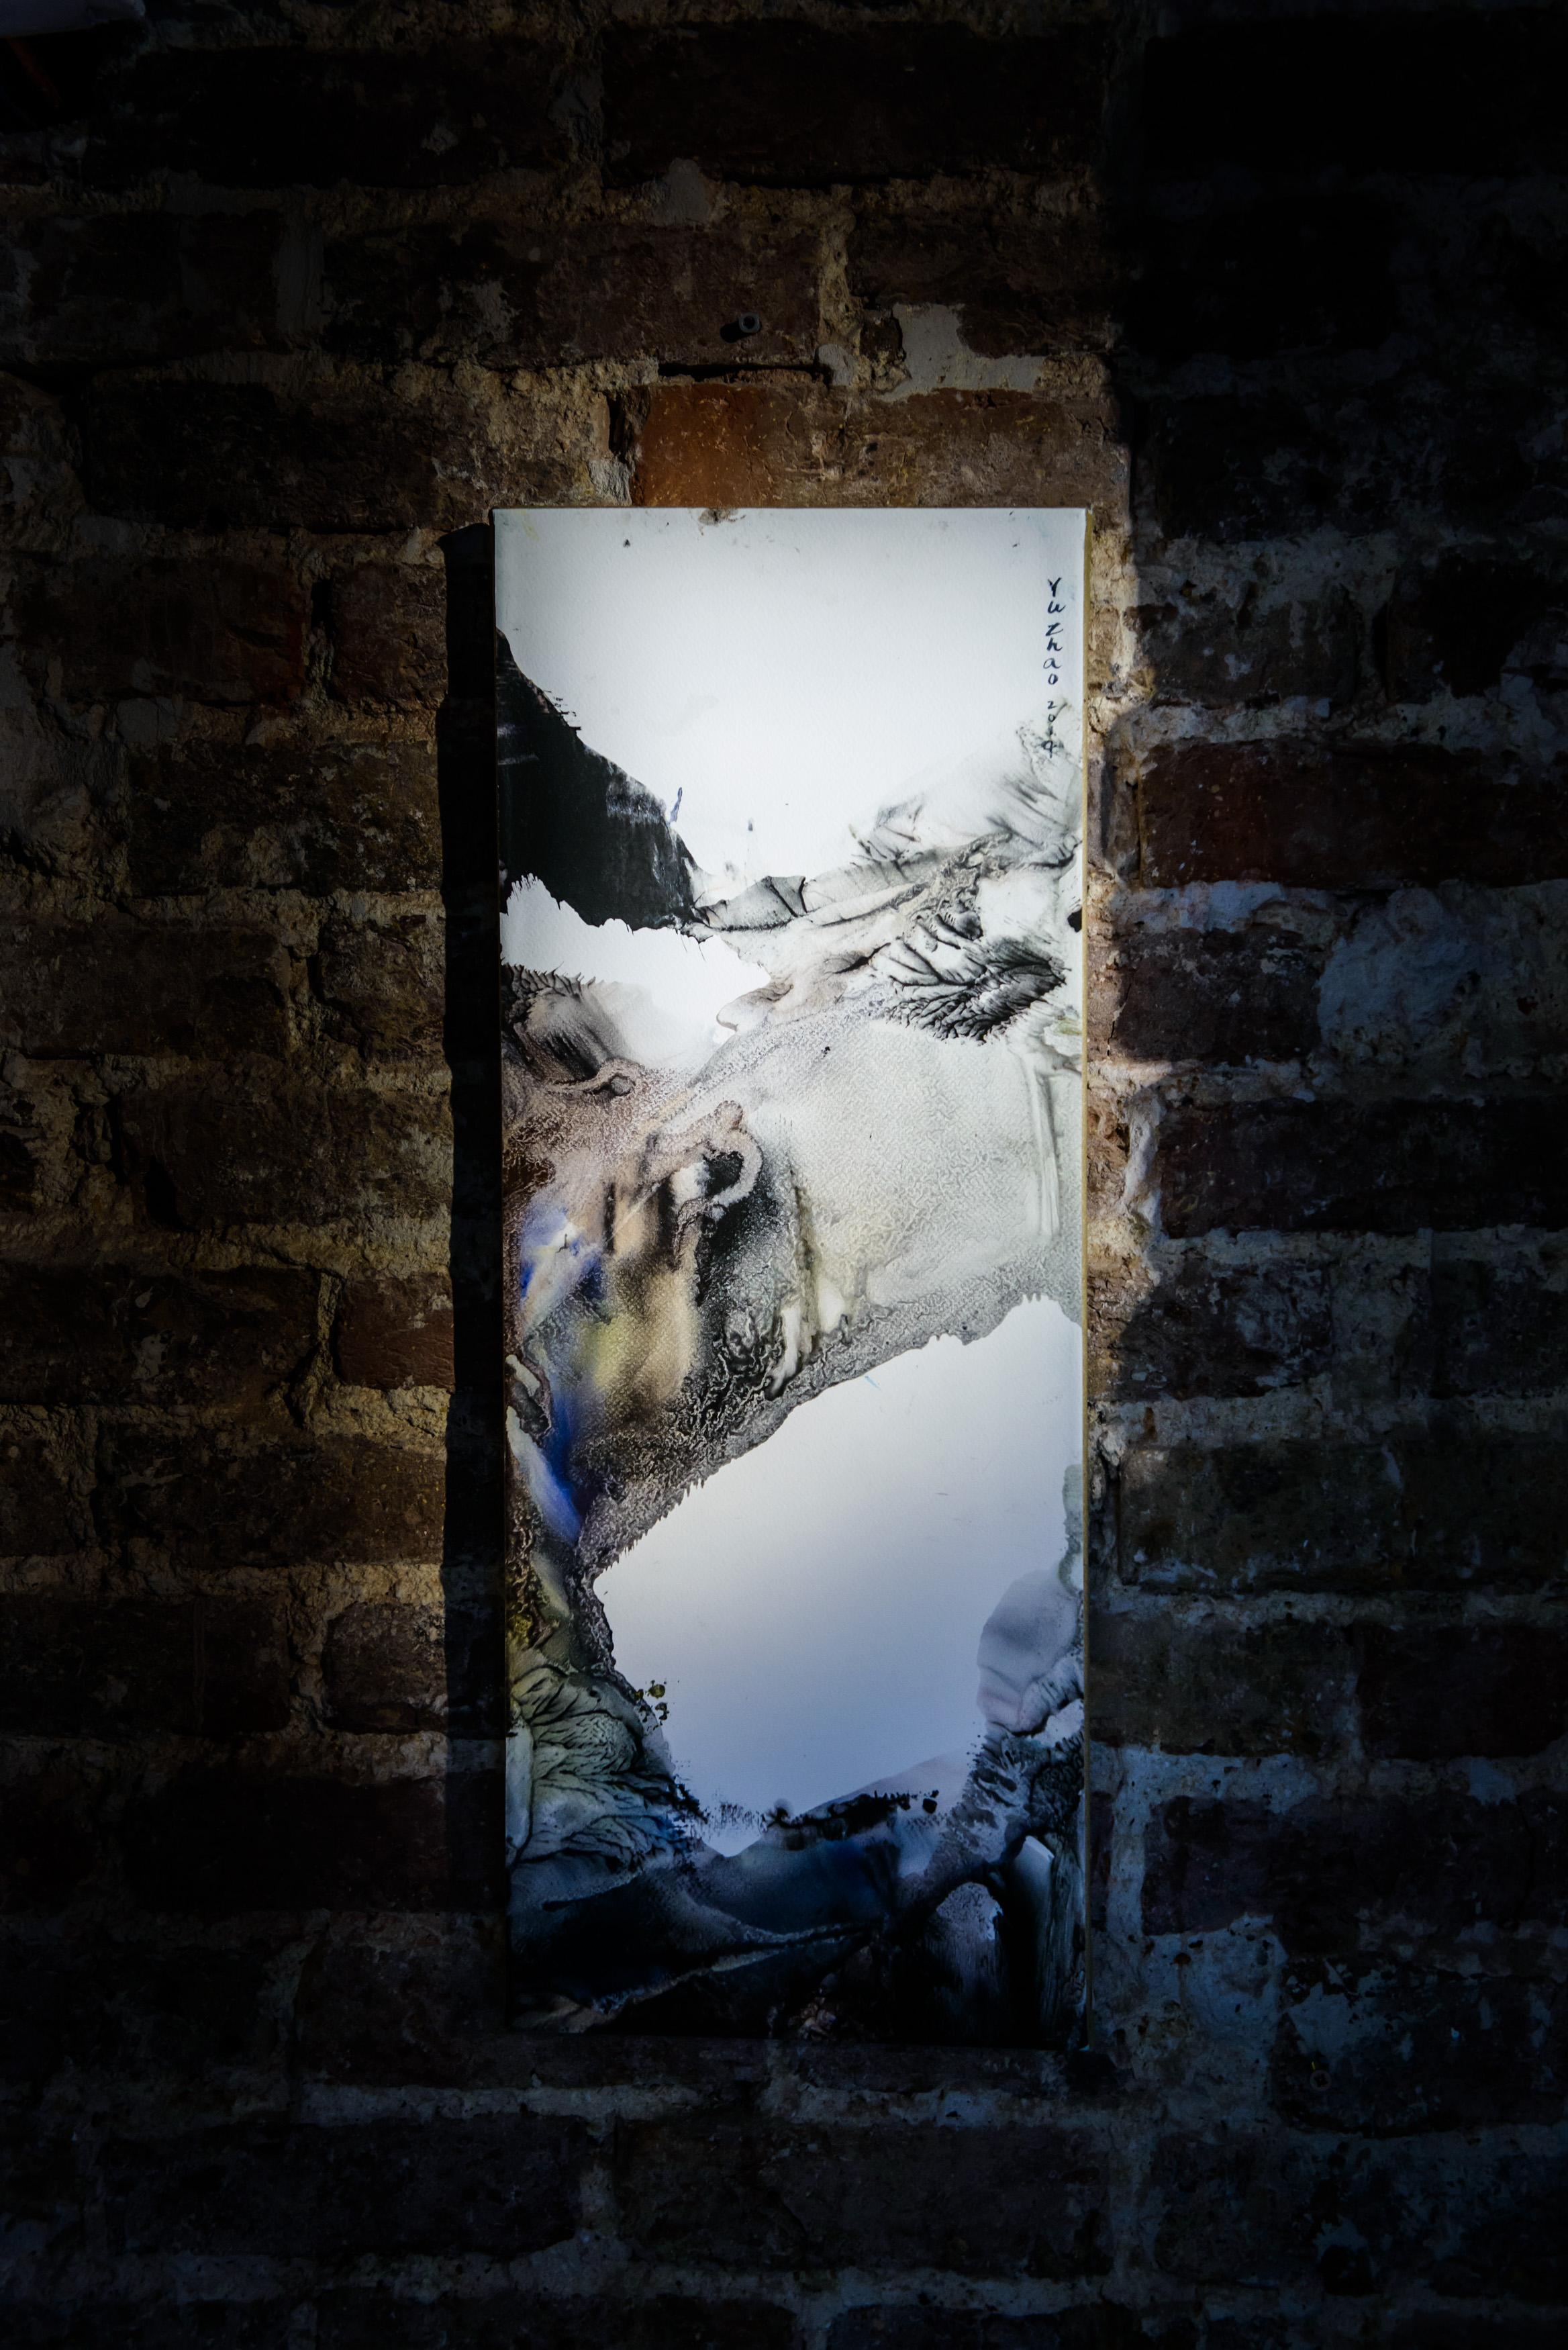 Exhibition in galerie associative 60Adada, Saint-Denis, 2014